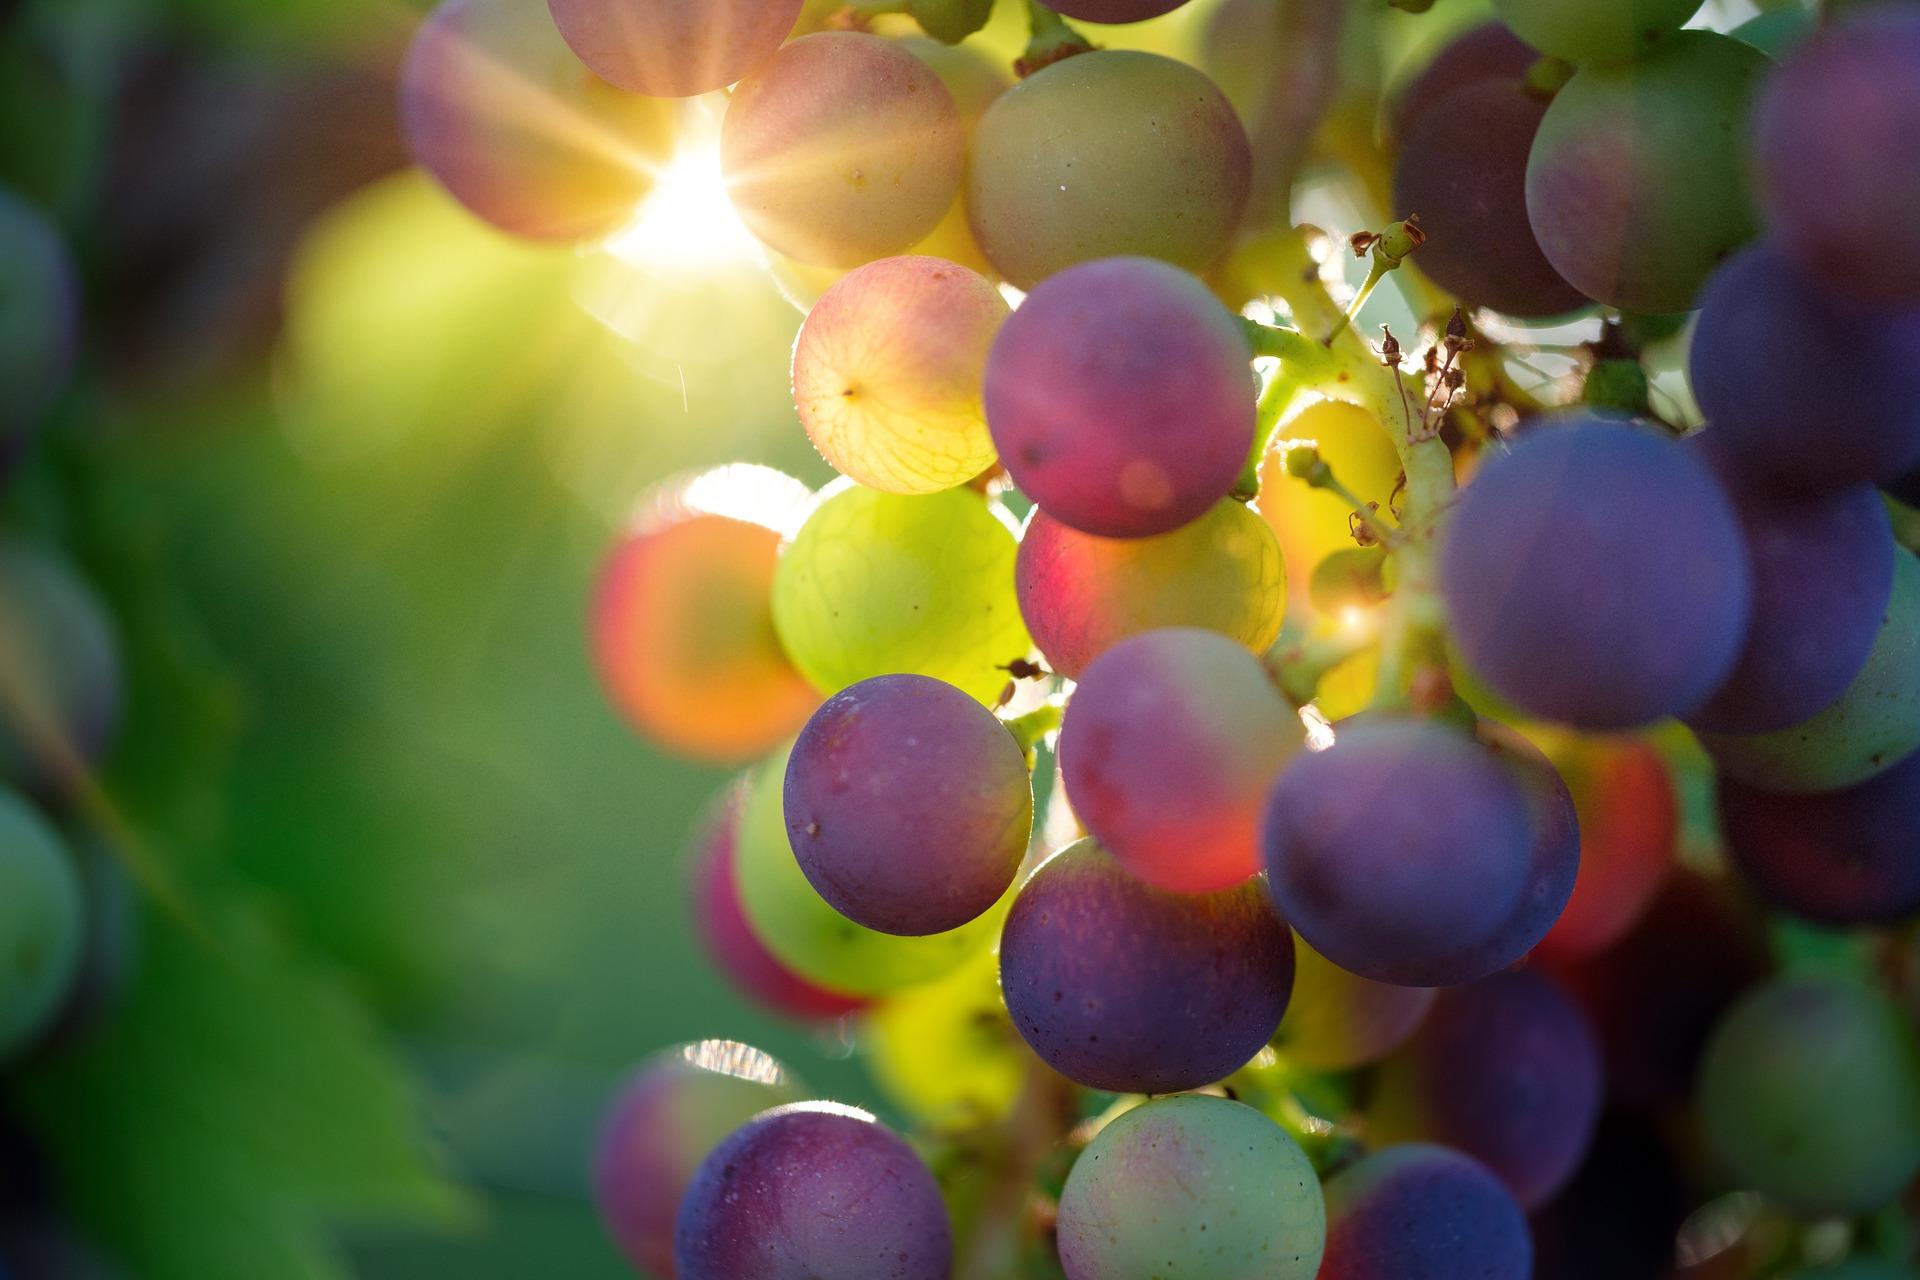 grapes-3550733_1920.jpg